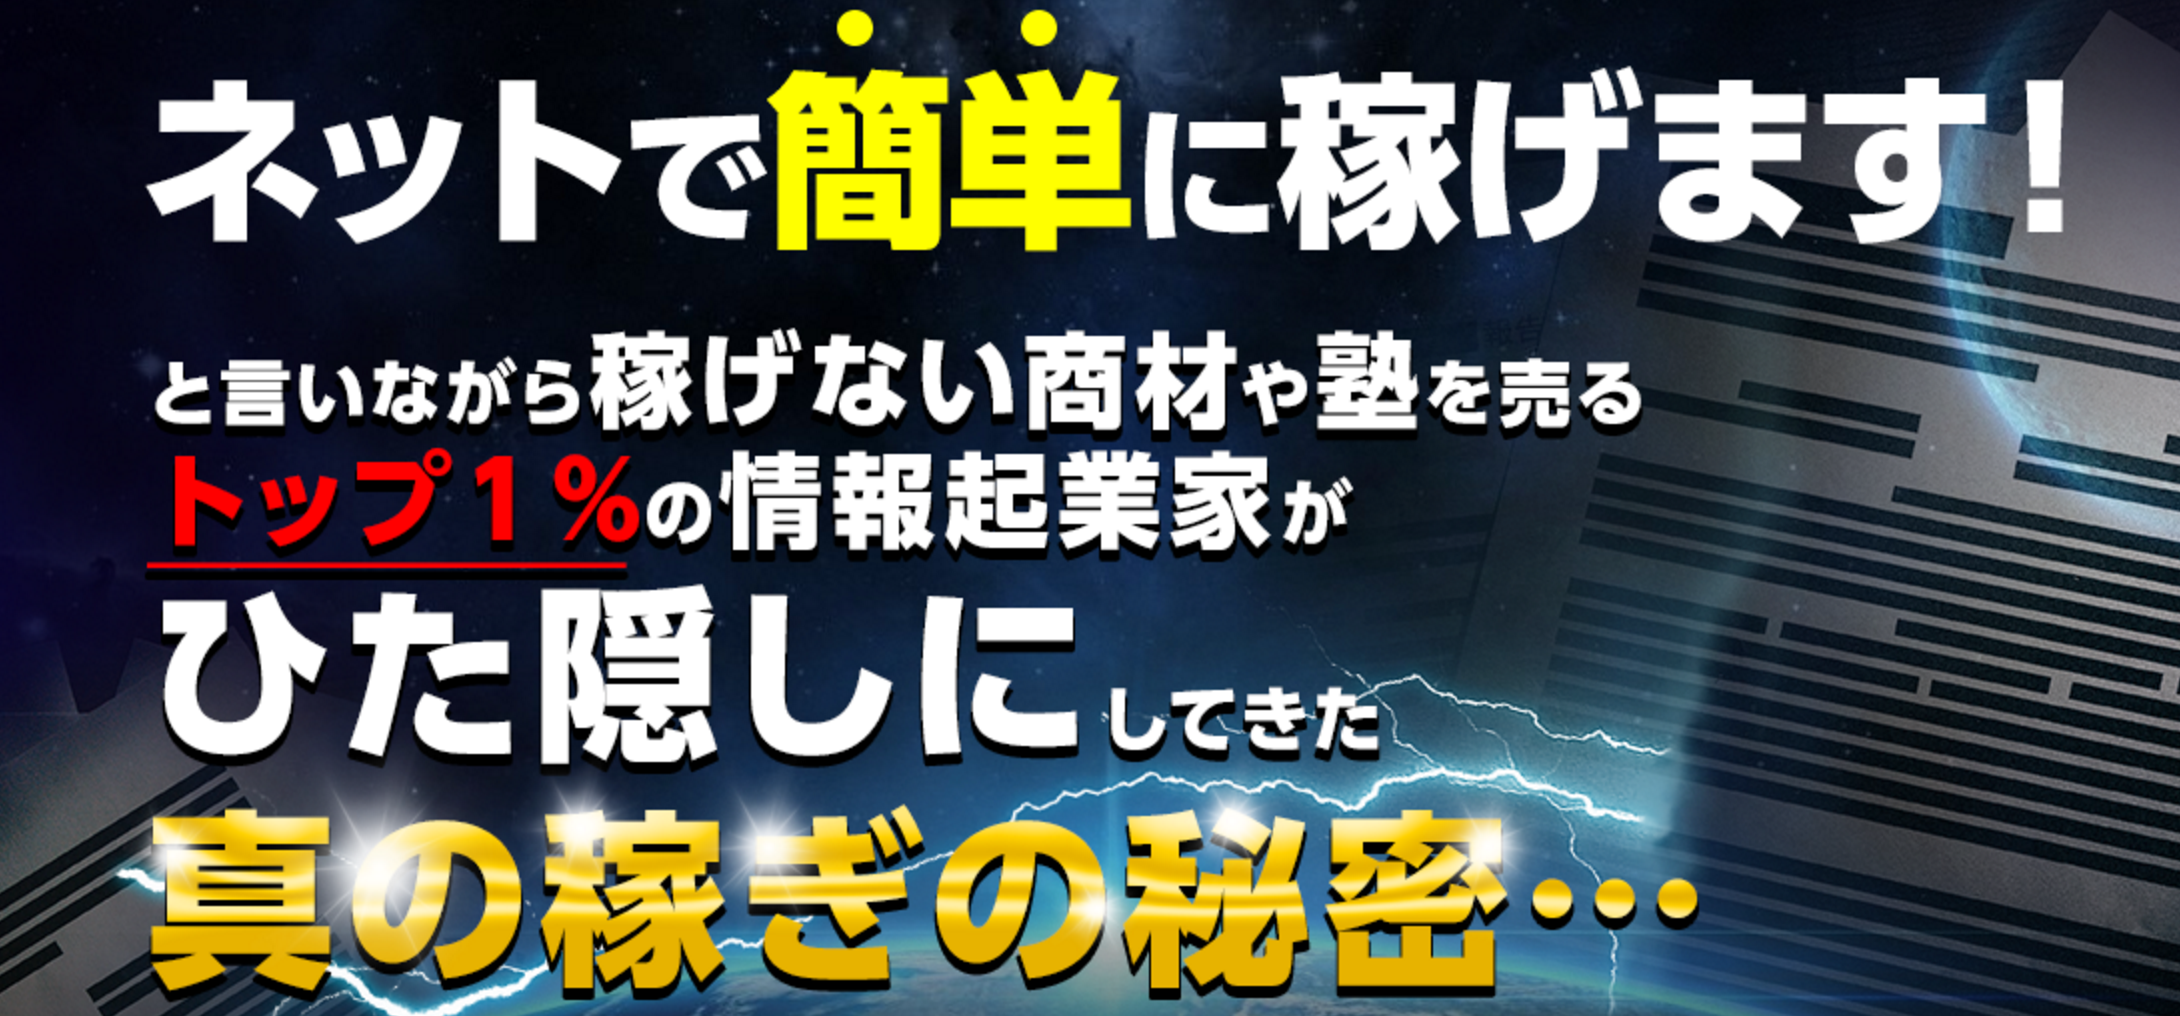 2016-10-18_20h21_36